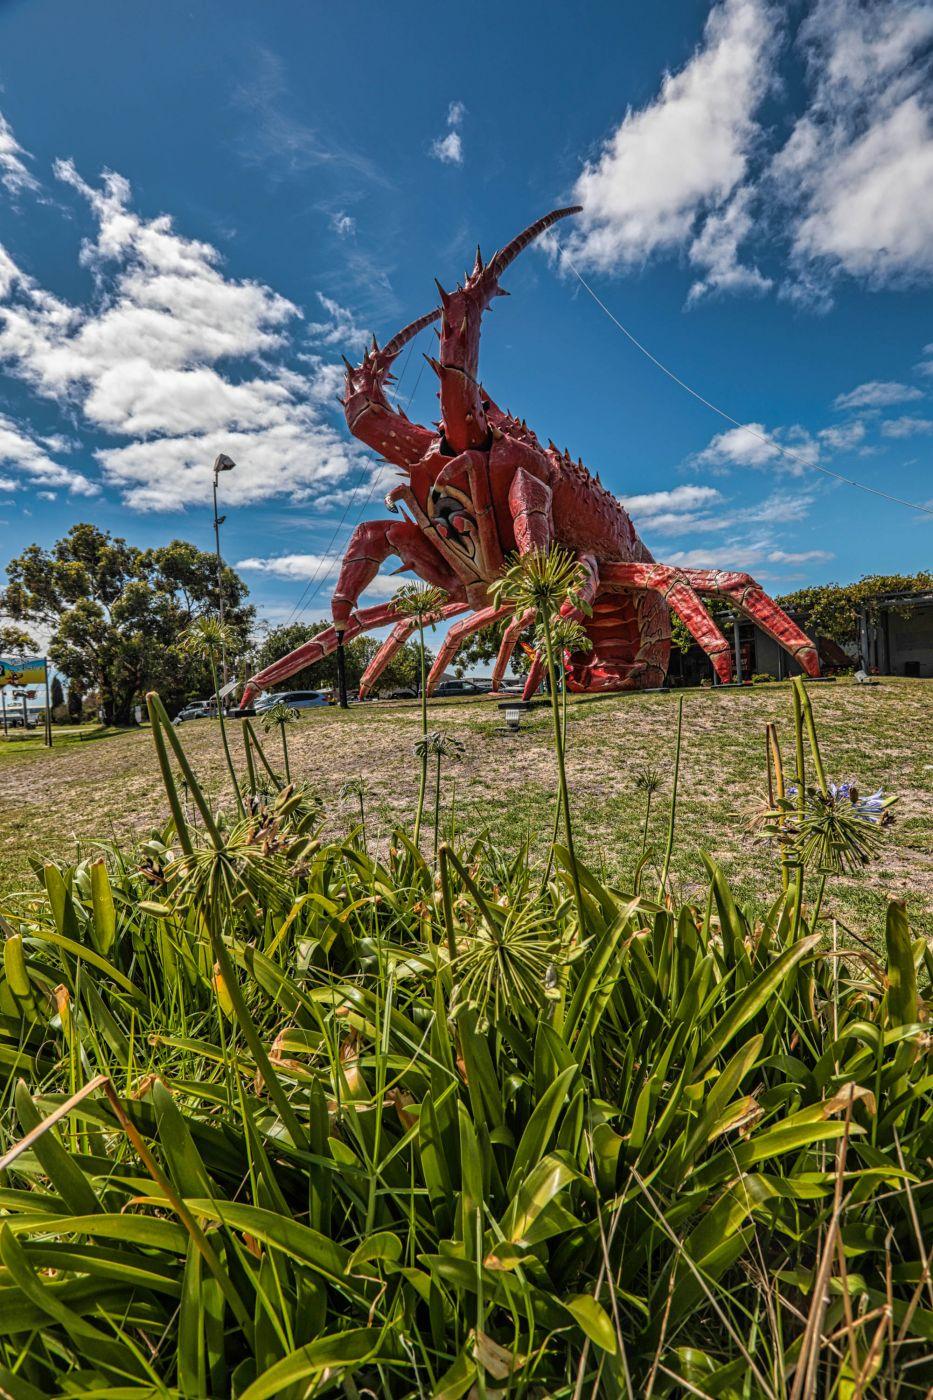 Giant Lobster Kingston SE, South Australia, Australia